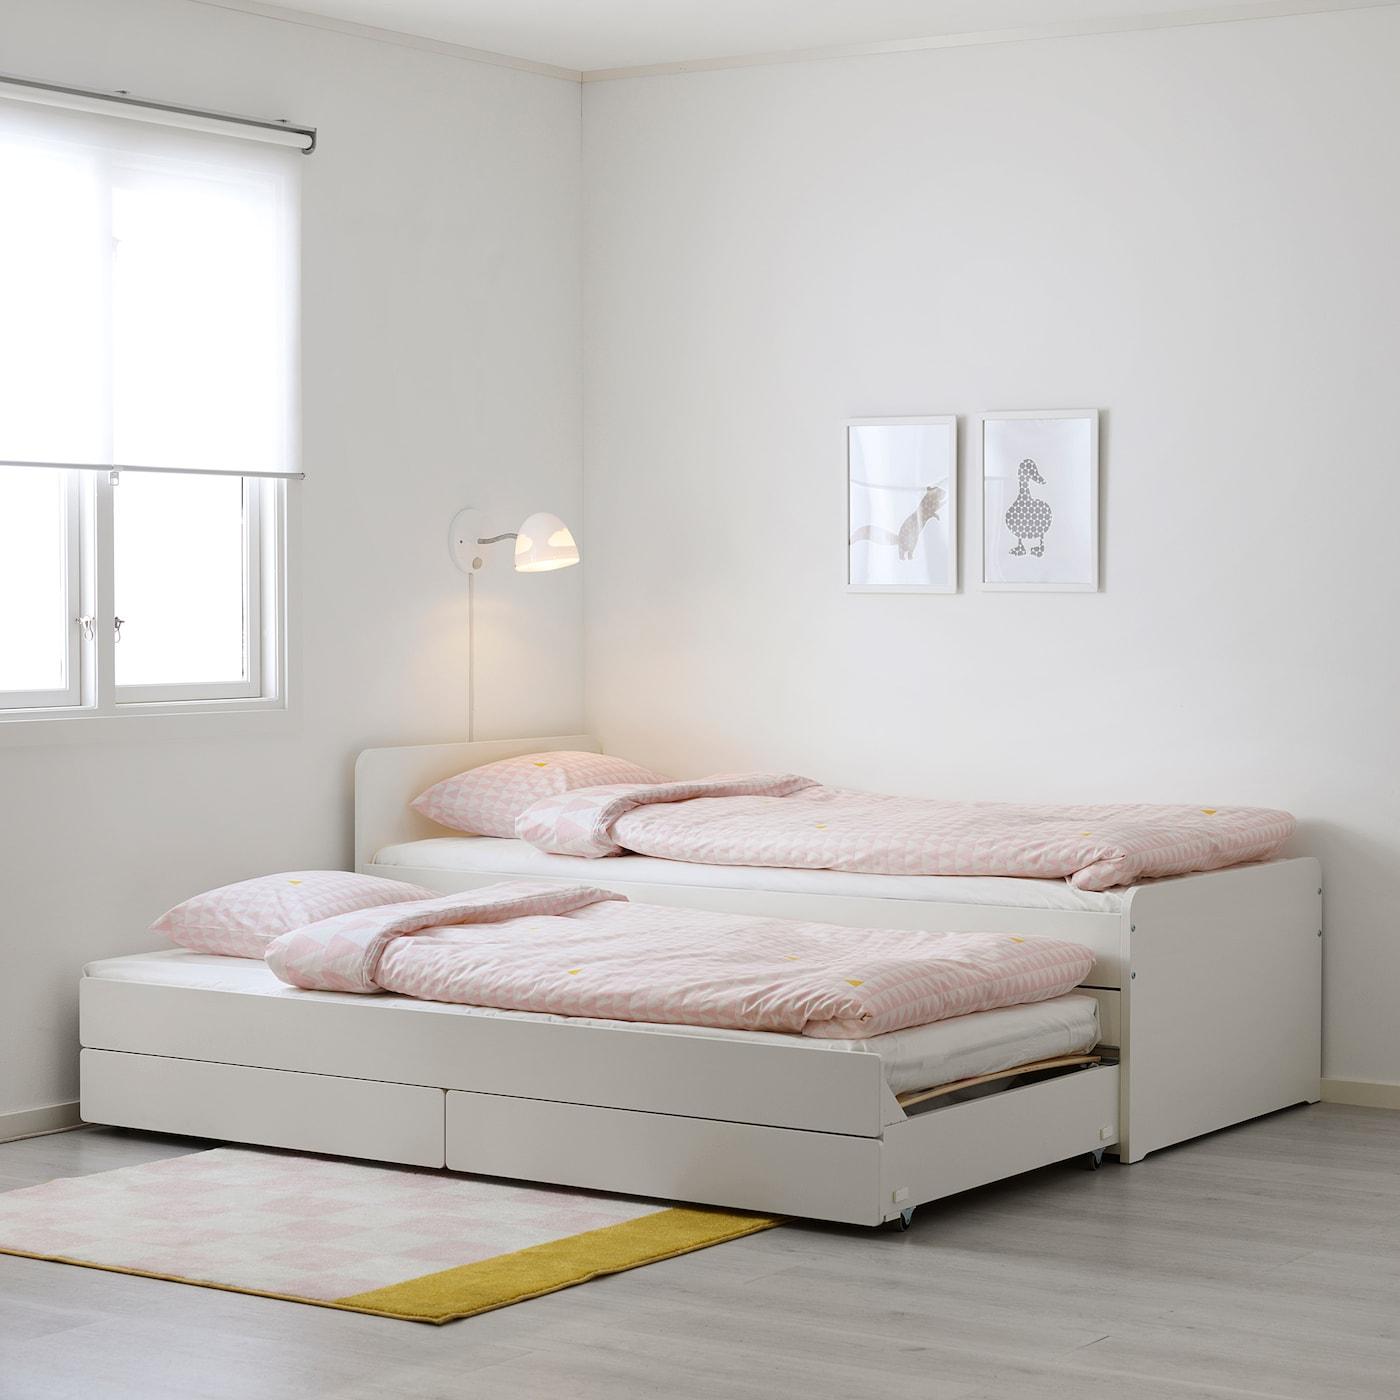 SLÄKT Bed frame with underbed and storage - white 6x6 cm